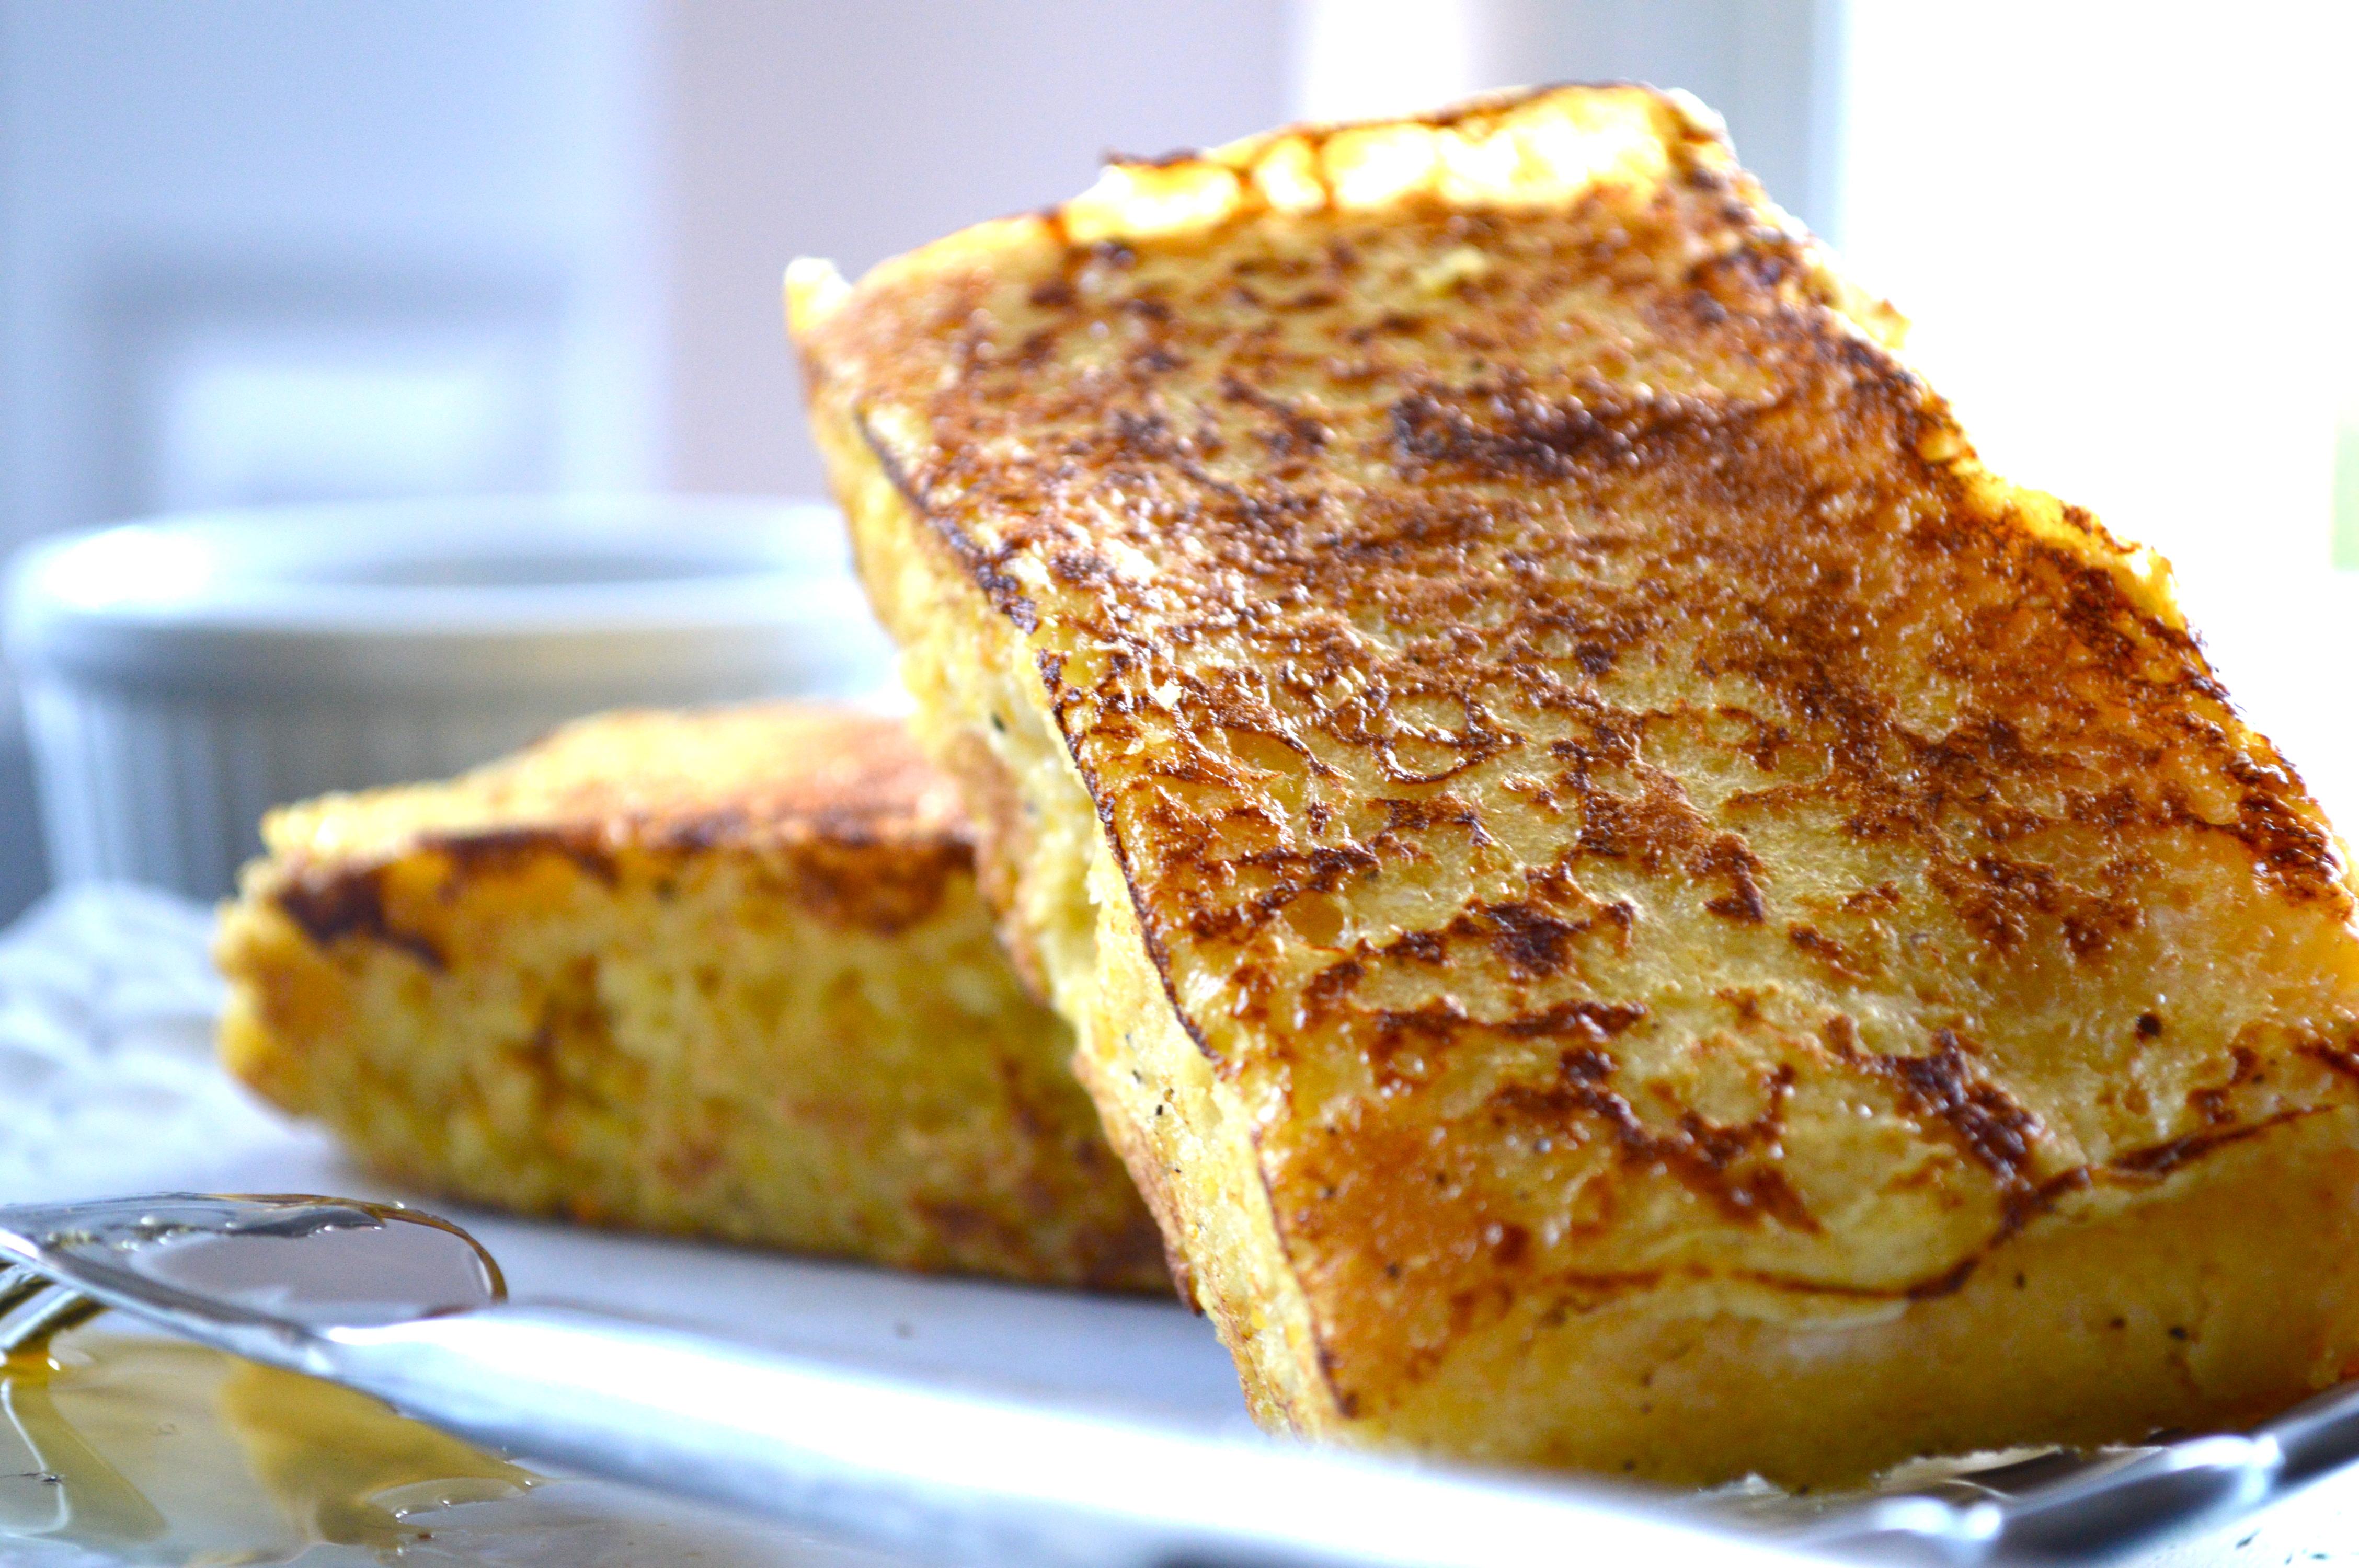 French Toast Corn Bread Gluten Free - Gluten Free Skinny